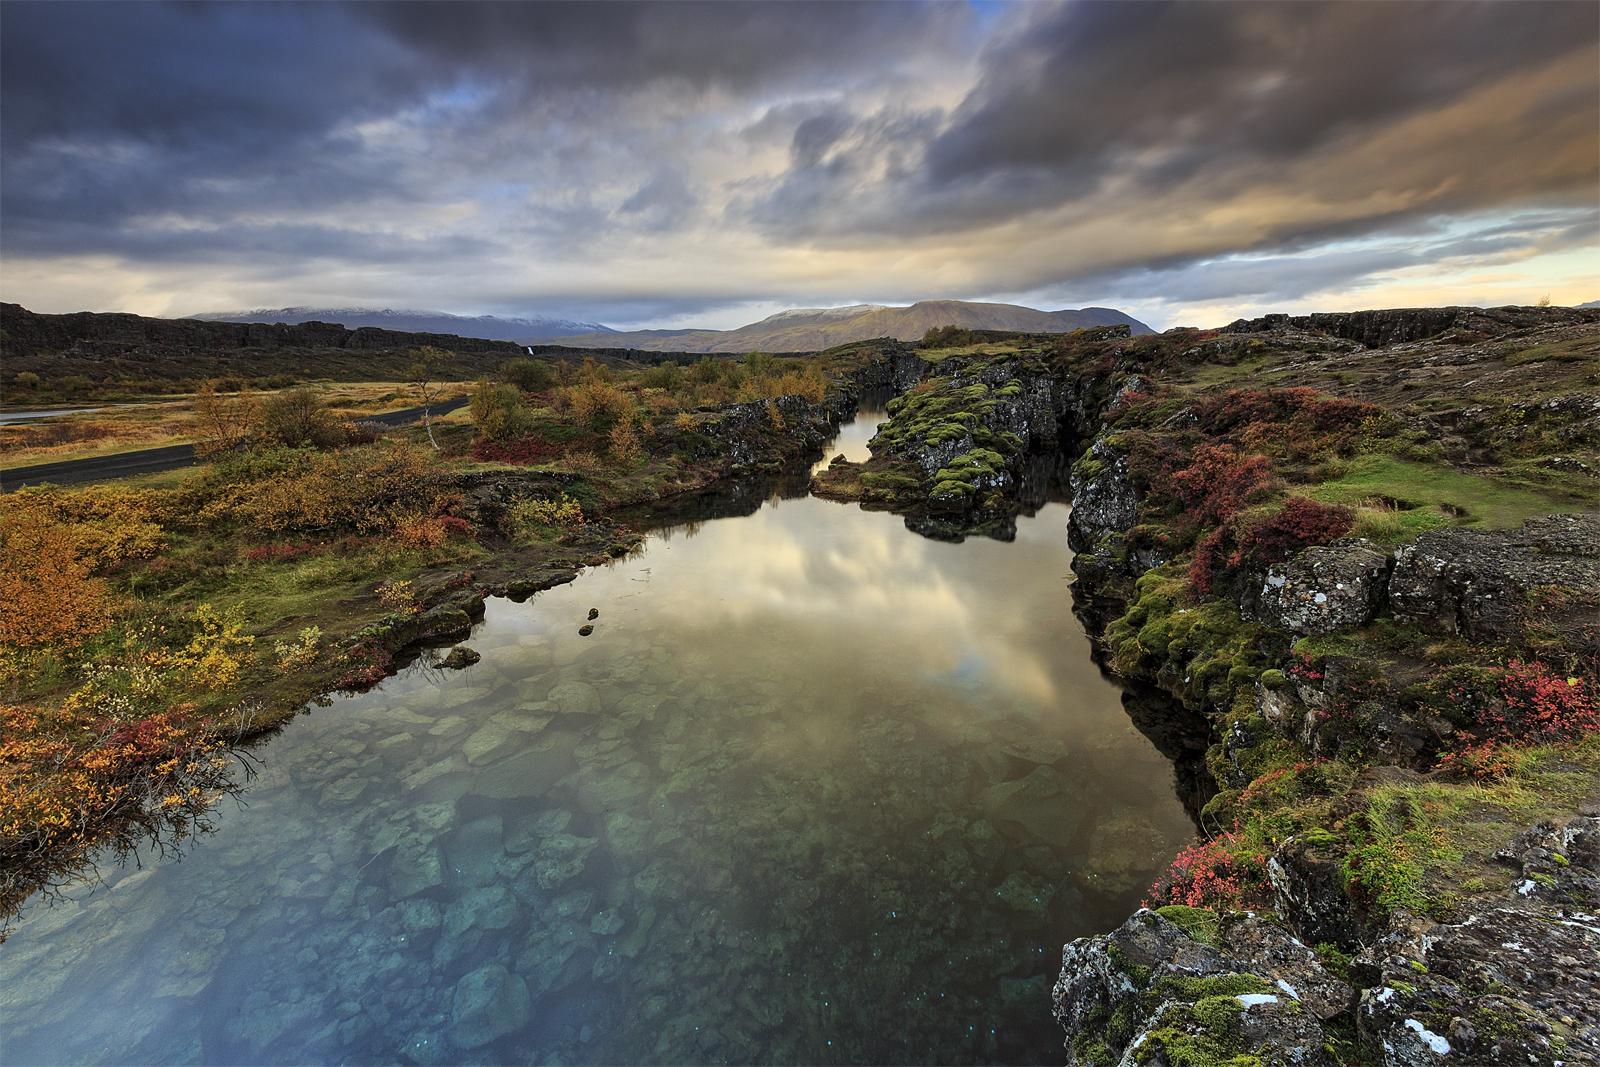 Guided 3 Day Tour of Iceland's South Coast, Golden Circle & Jokulsarlon Glacier Lagoon - day 1